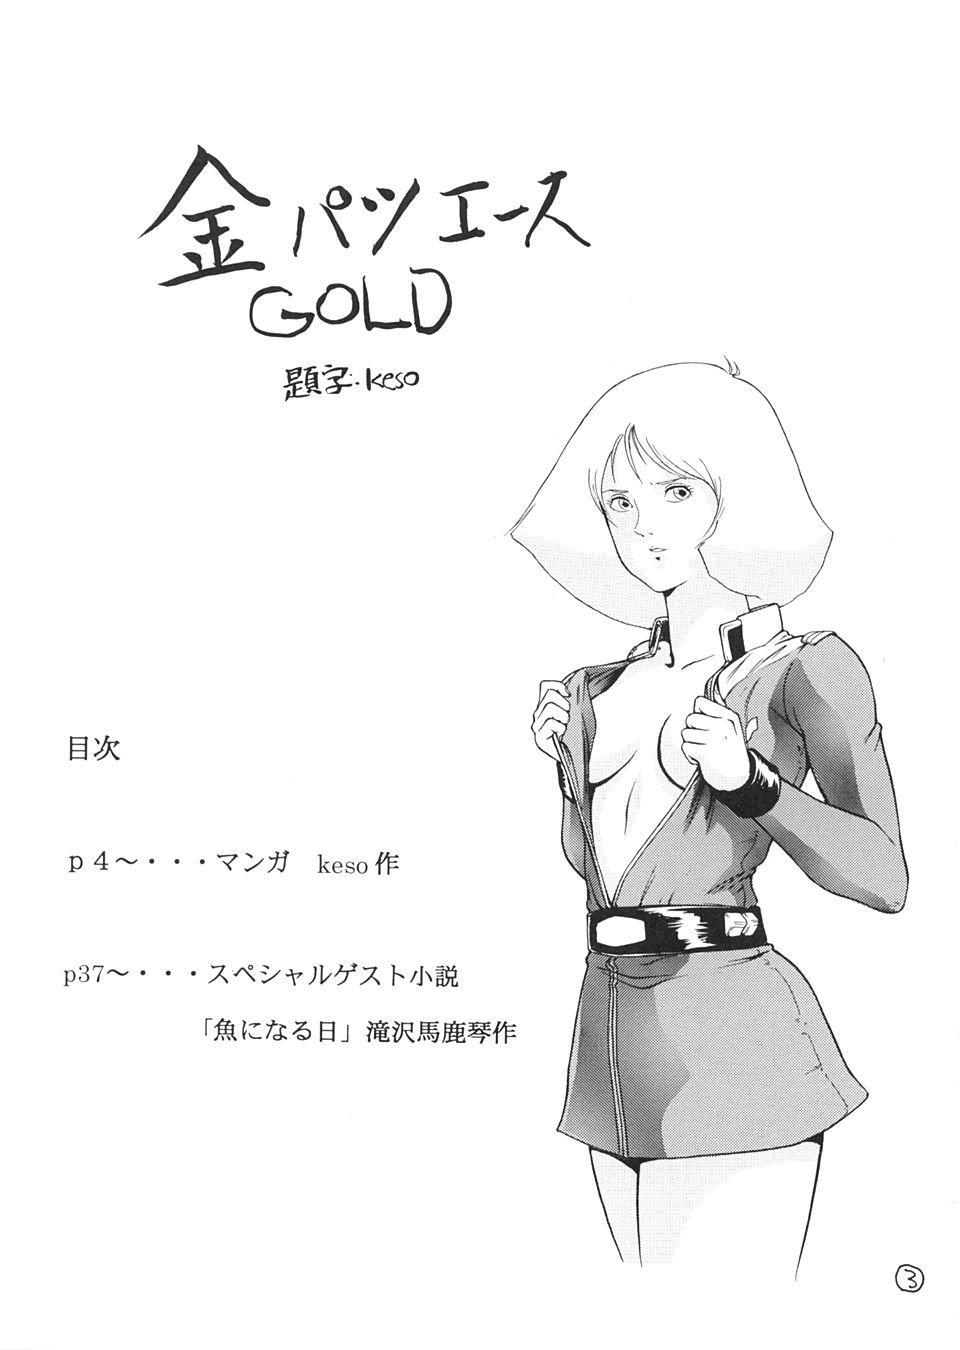 Kinpatsu A Gold 1